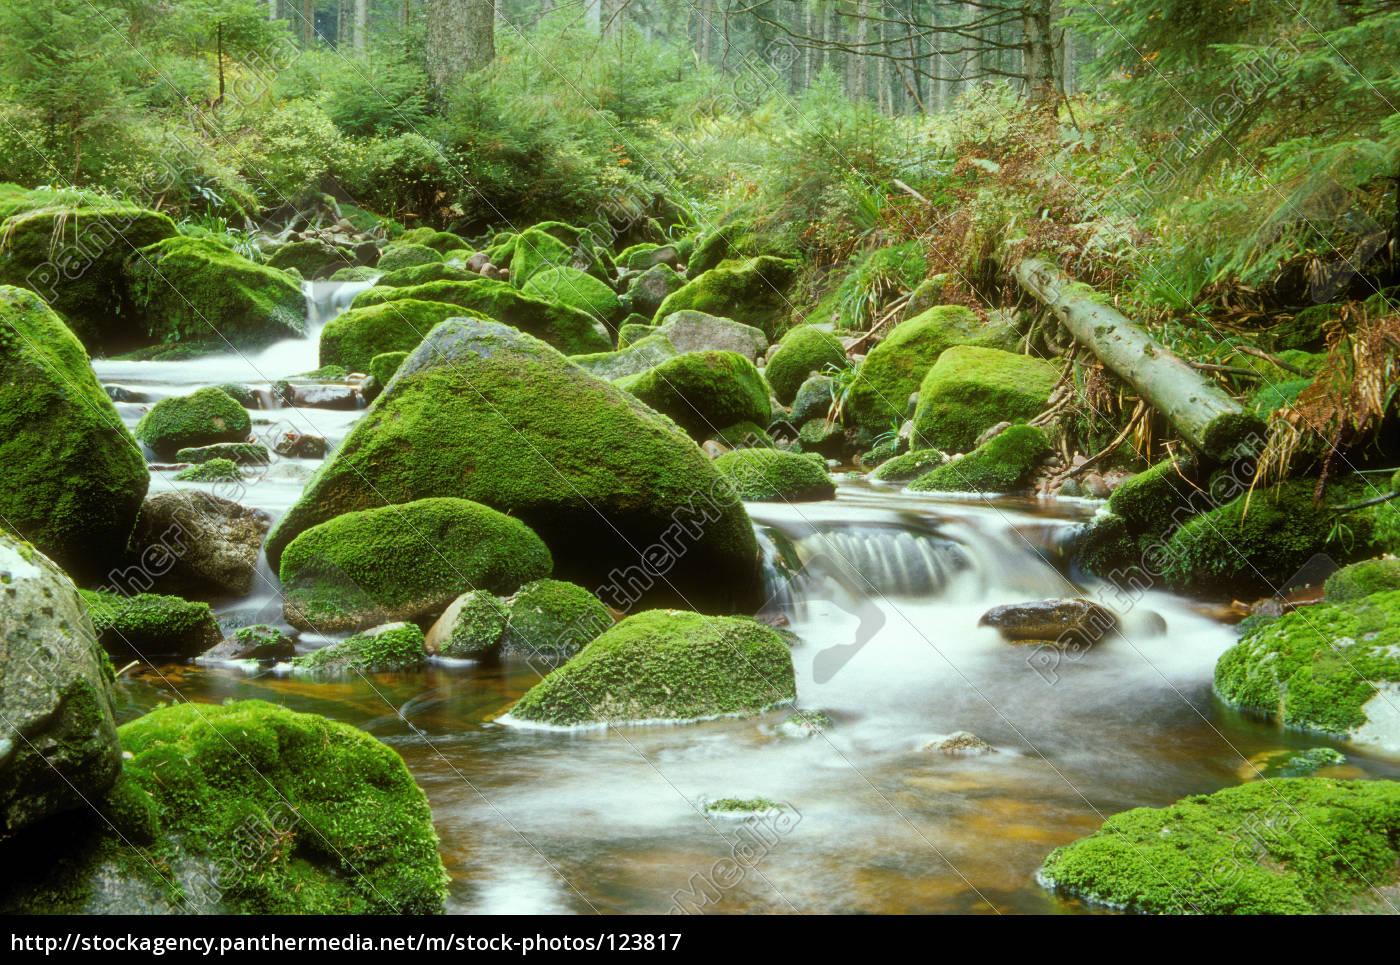 wild, creek, in, the, northern, black - 123817